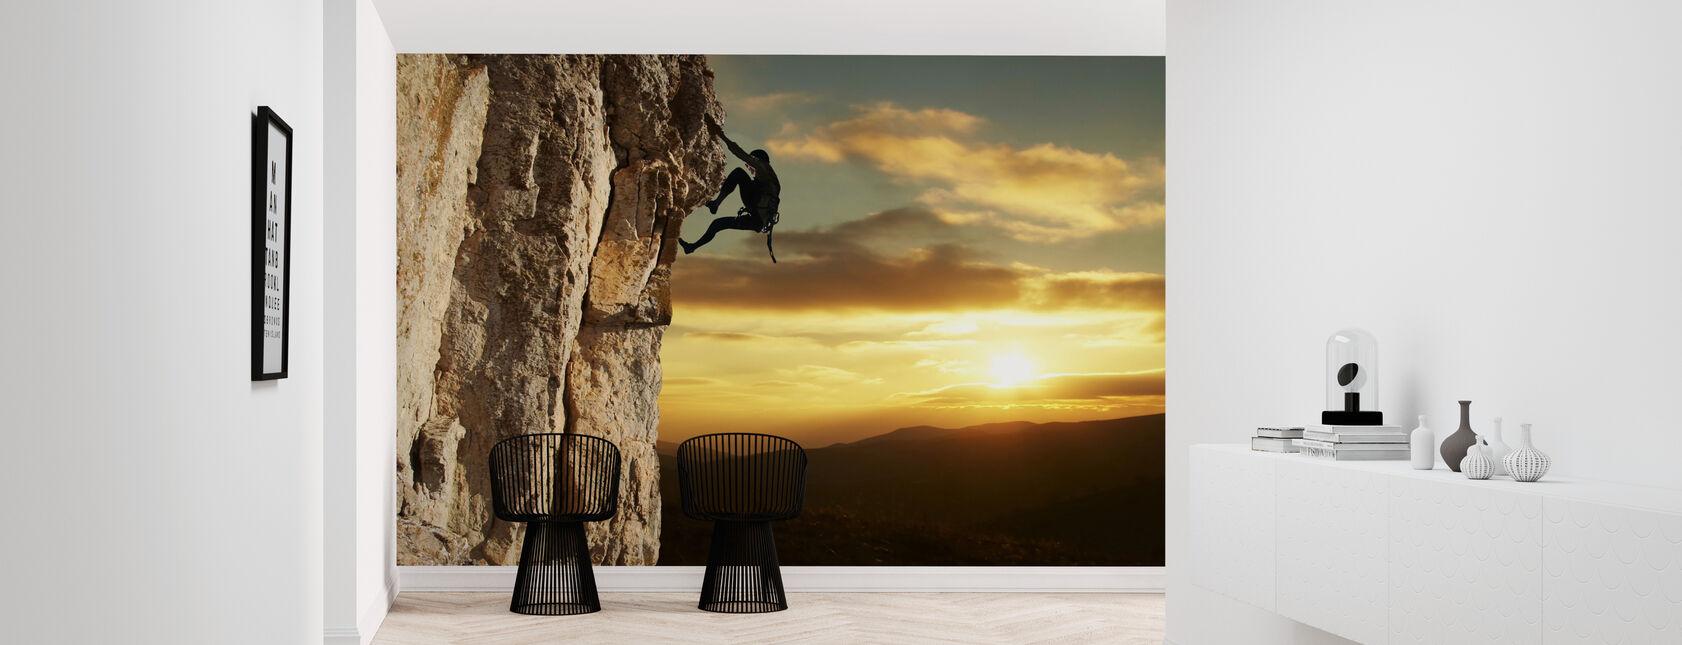 Rock Climber - Wallpaper - Hallway